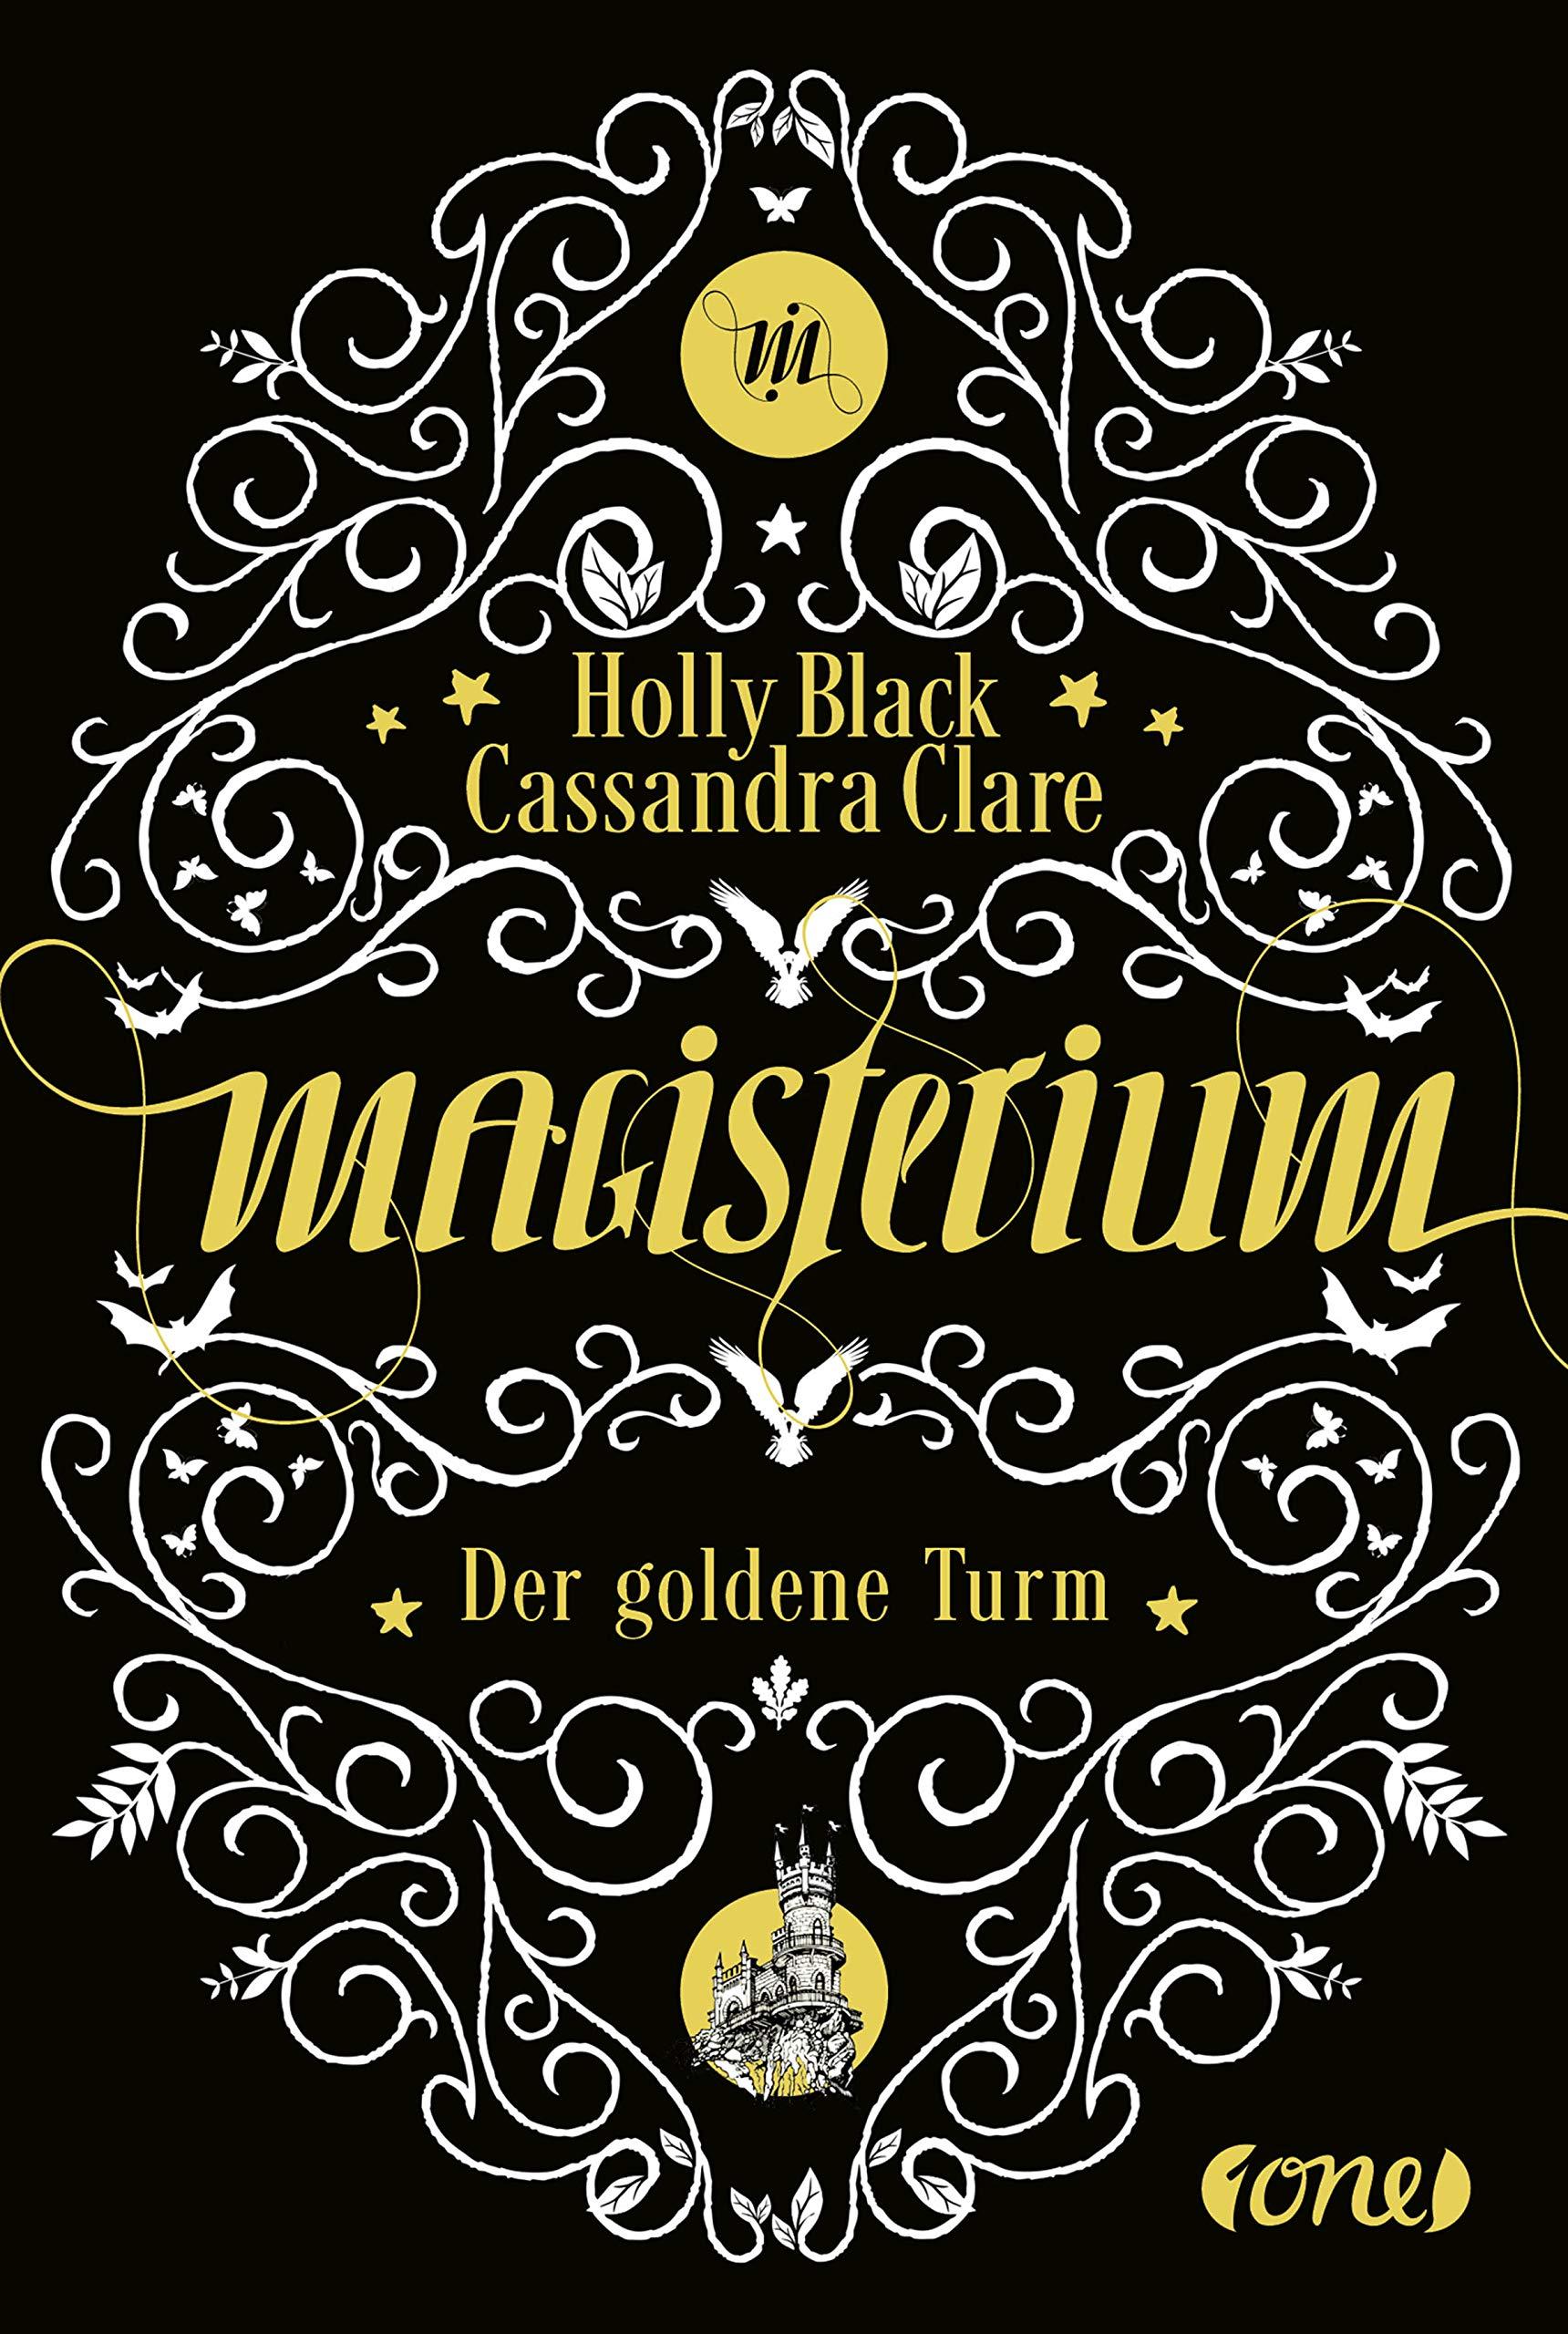 https://juliassammelsurium.blogspot.com/2021/04/reihenvorstellung-magisterium-holly.html